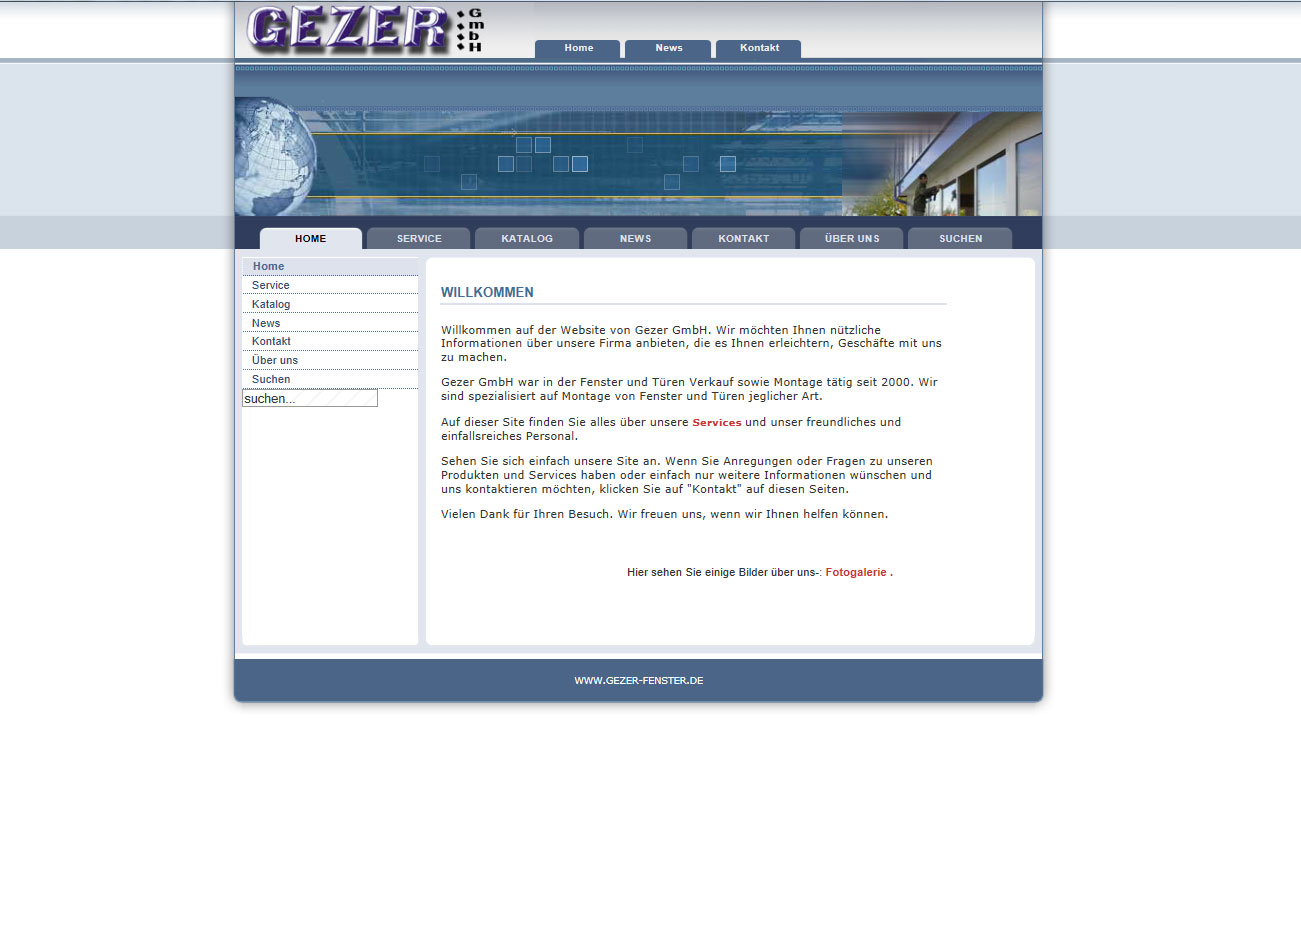 Gezer GmbH